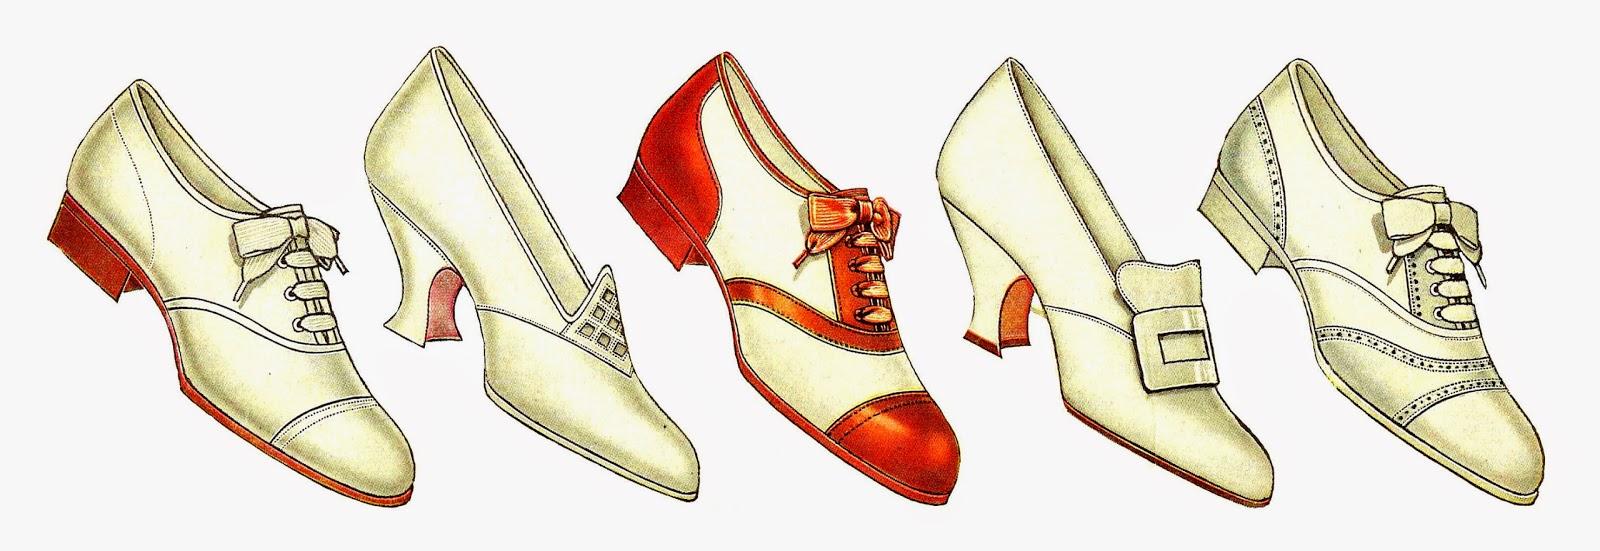 Free Fashion Clip Art: 5 Vintage Women's Shoe Graphics Collage Sheet 1917  Fashion